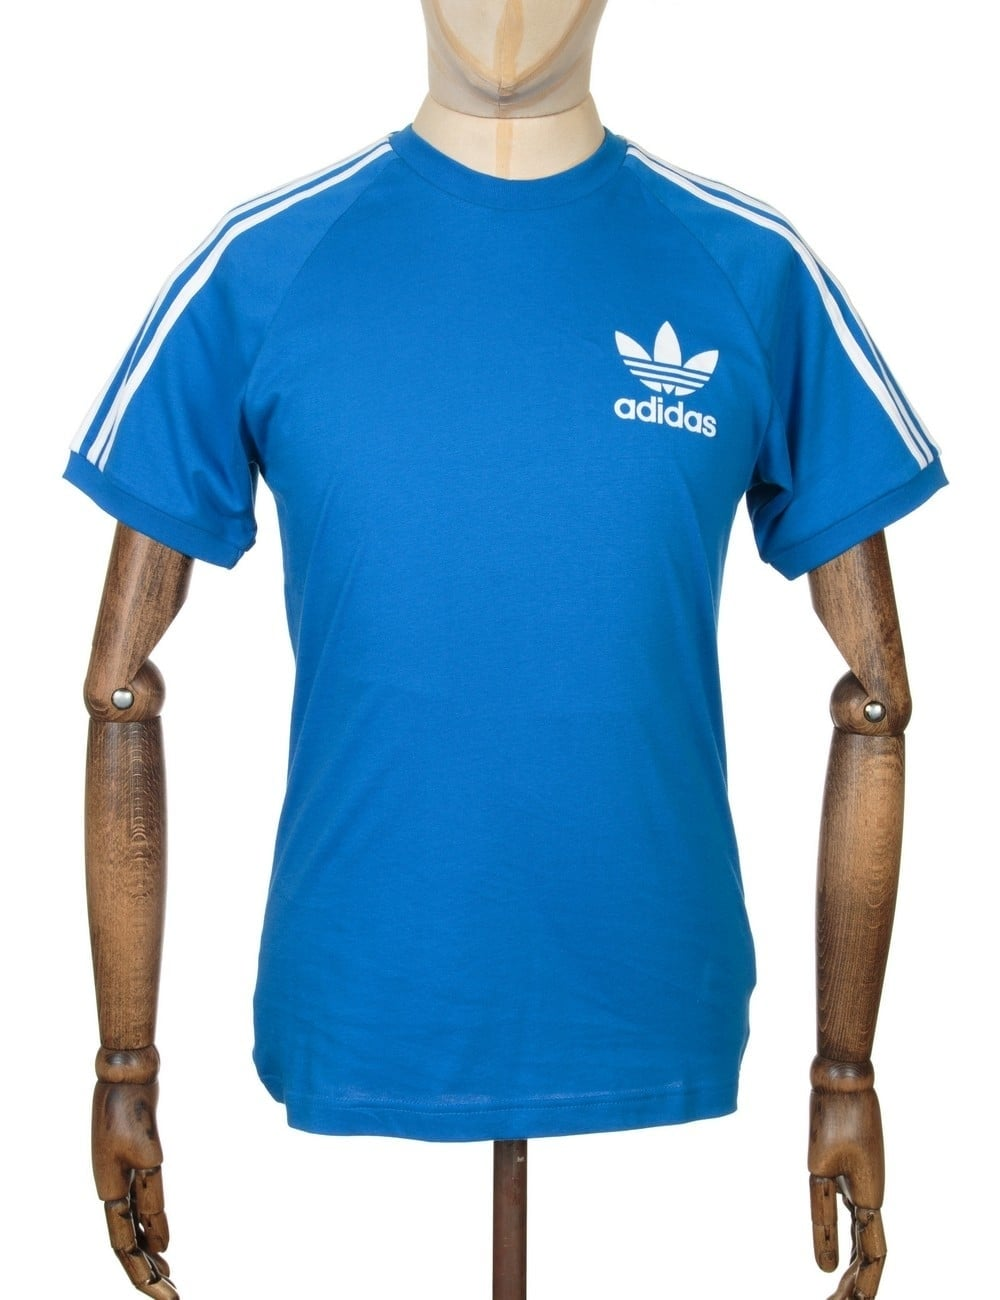 adidas originals california retro tshirt bluebird